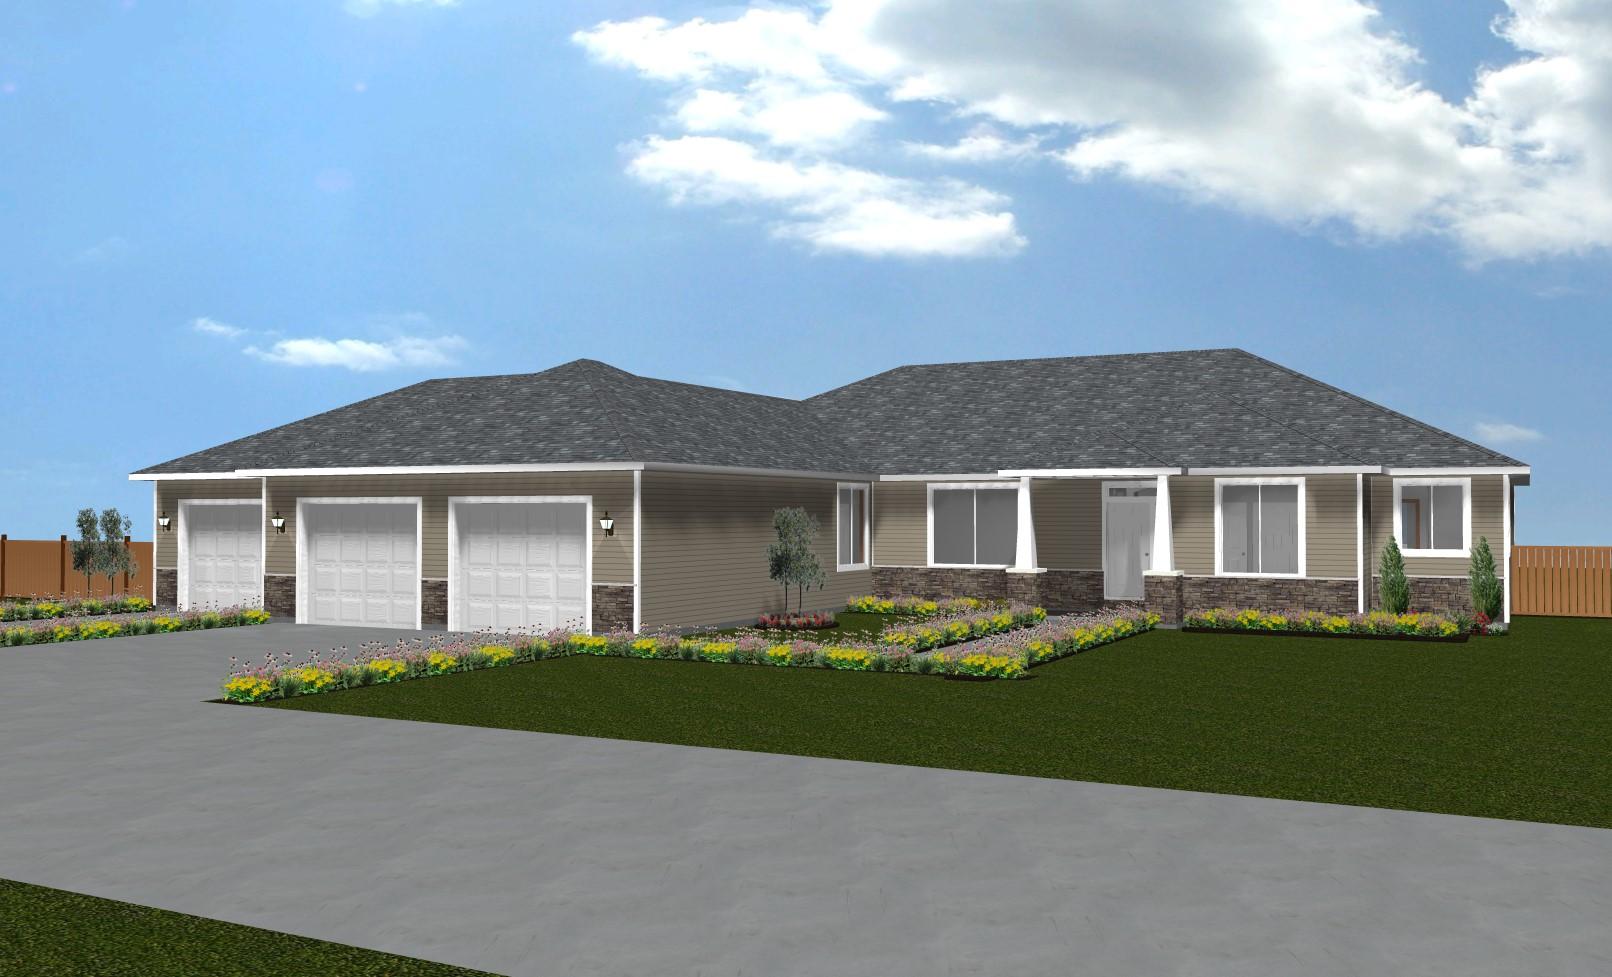 houses with 3 car garage houses with 3 car garage